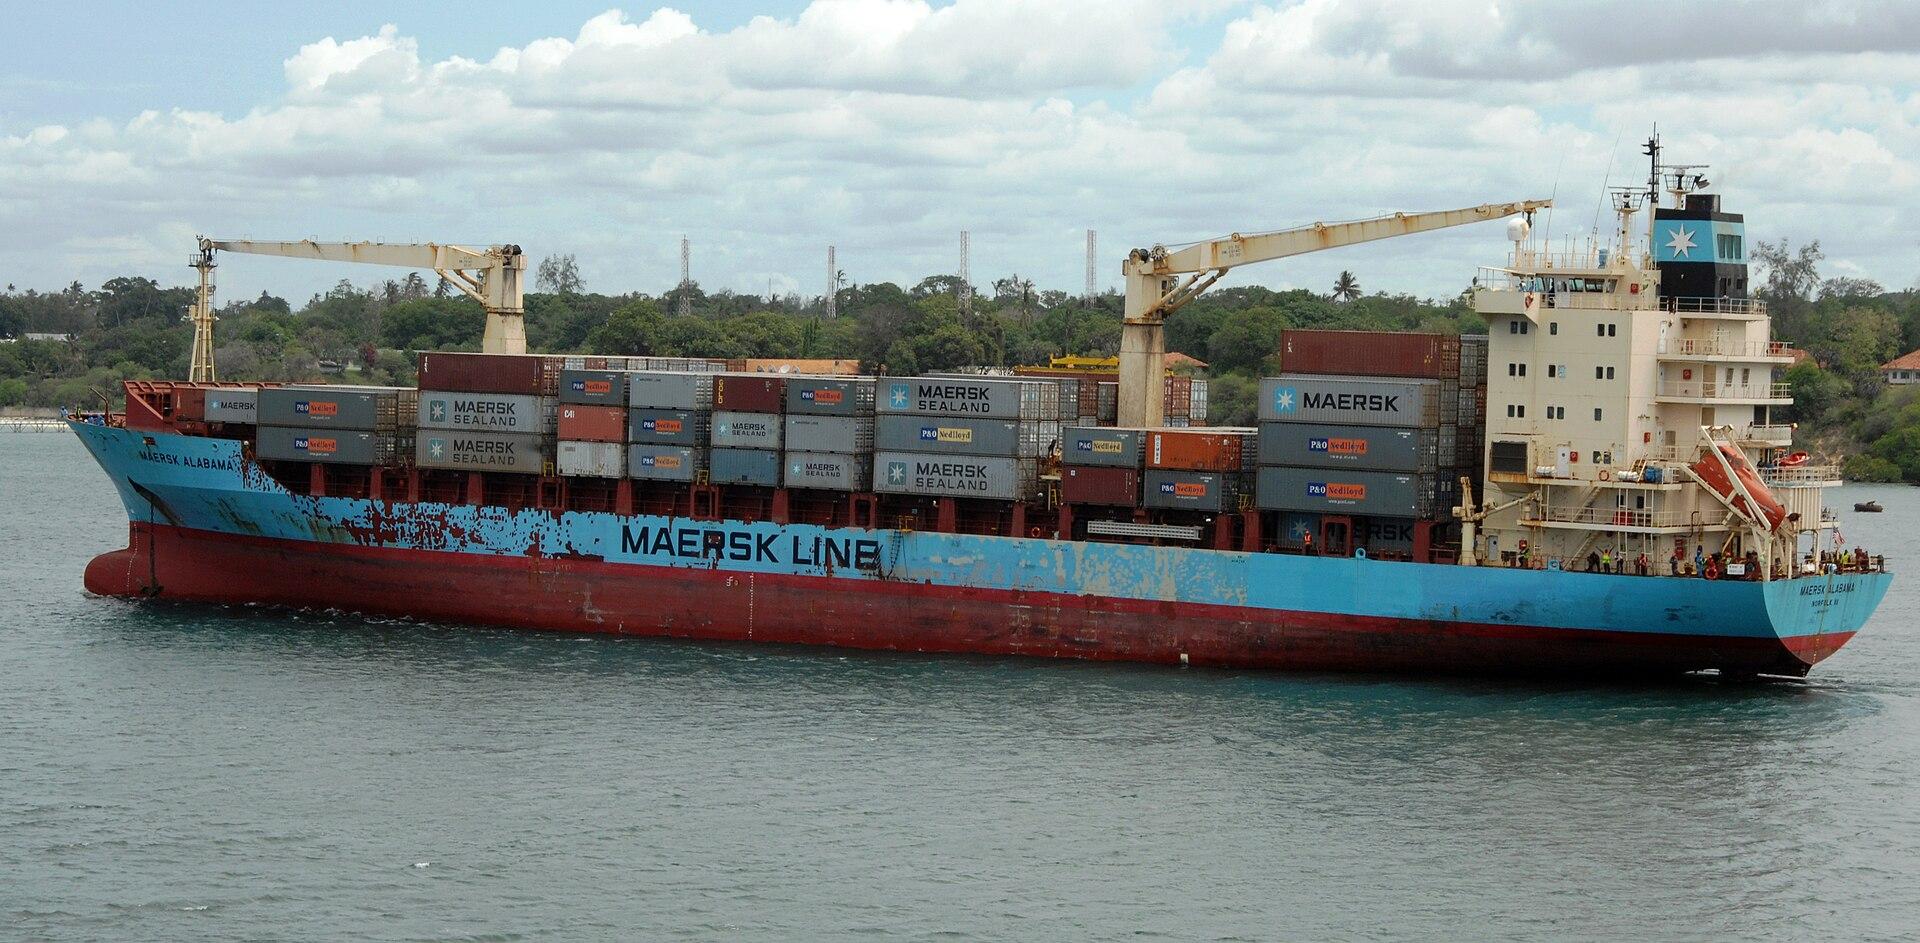 International Construction Equipment Shipping for Excavators